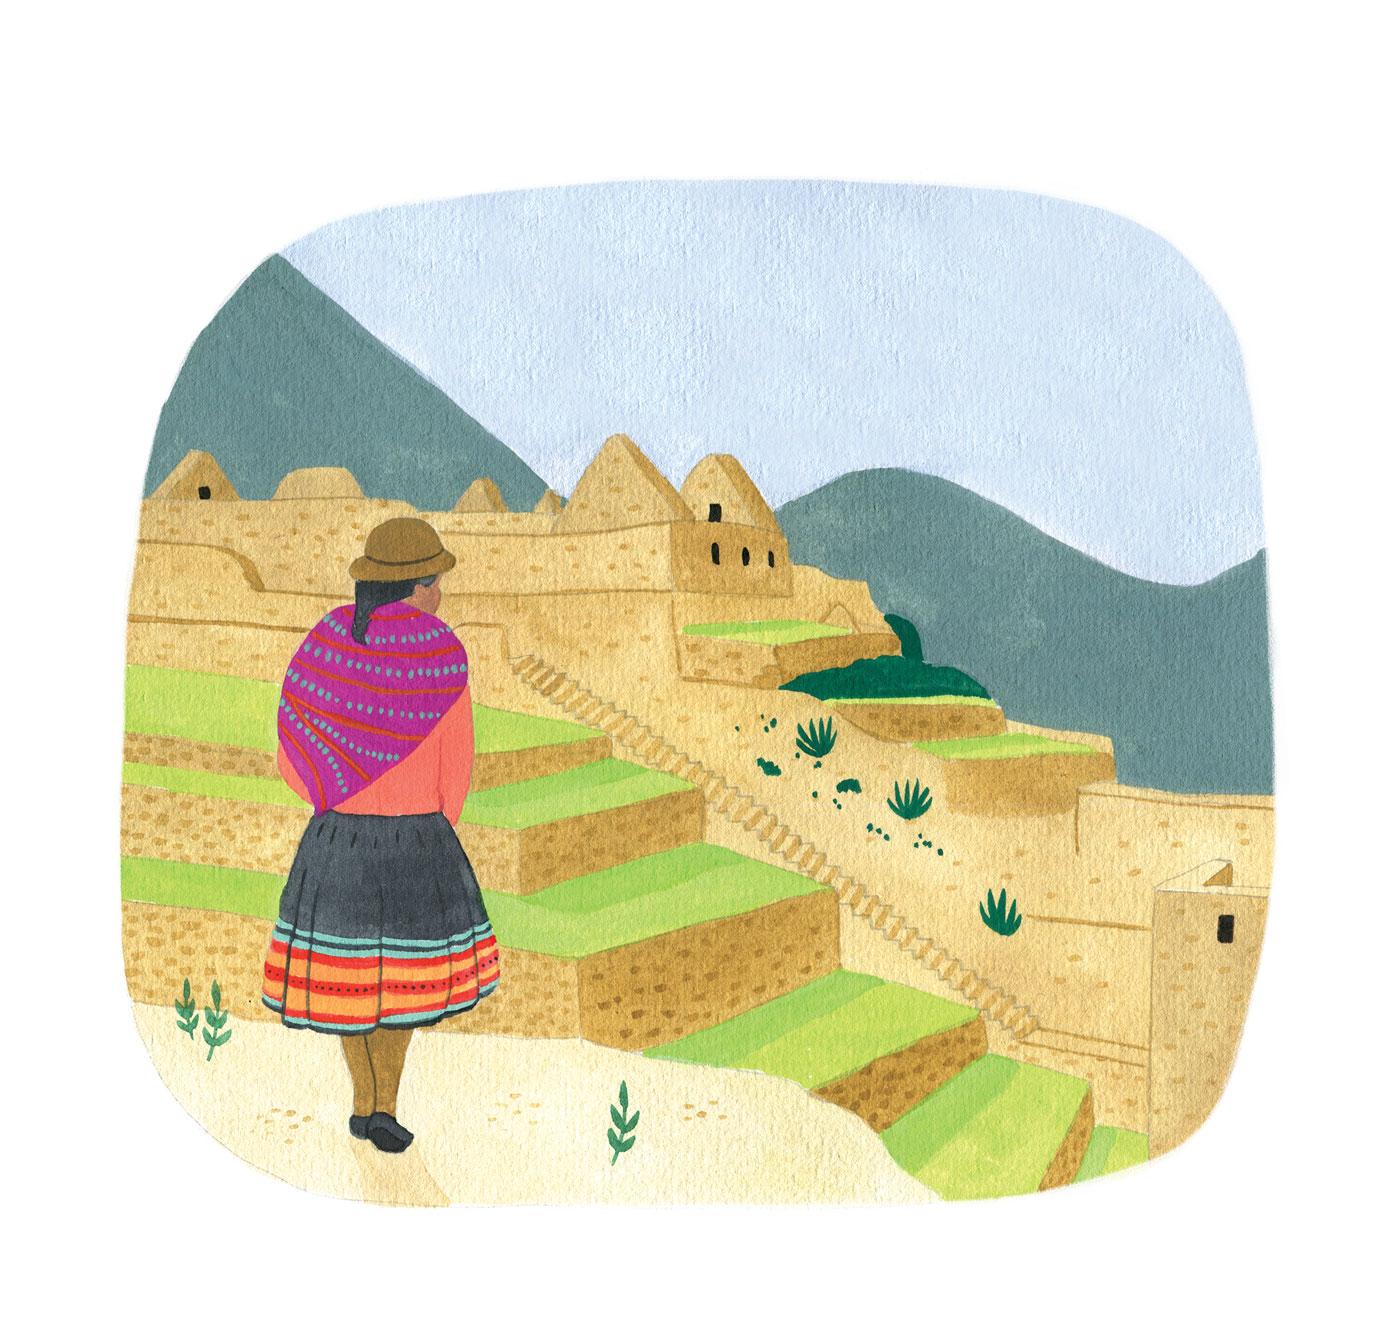 Peru-machu-picchu-travel-illustration.jpg